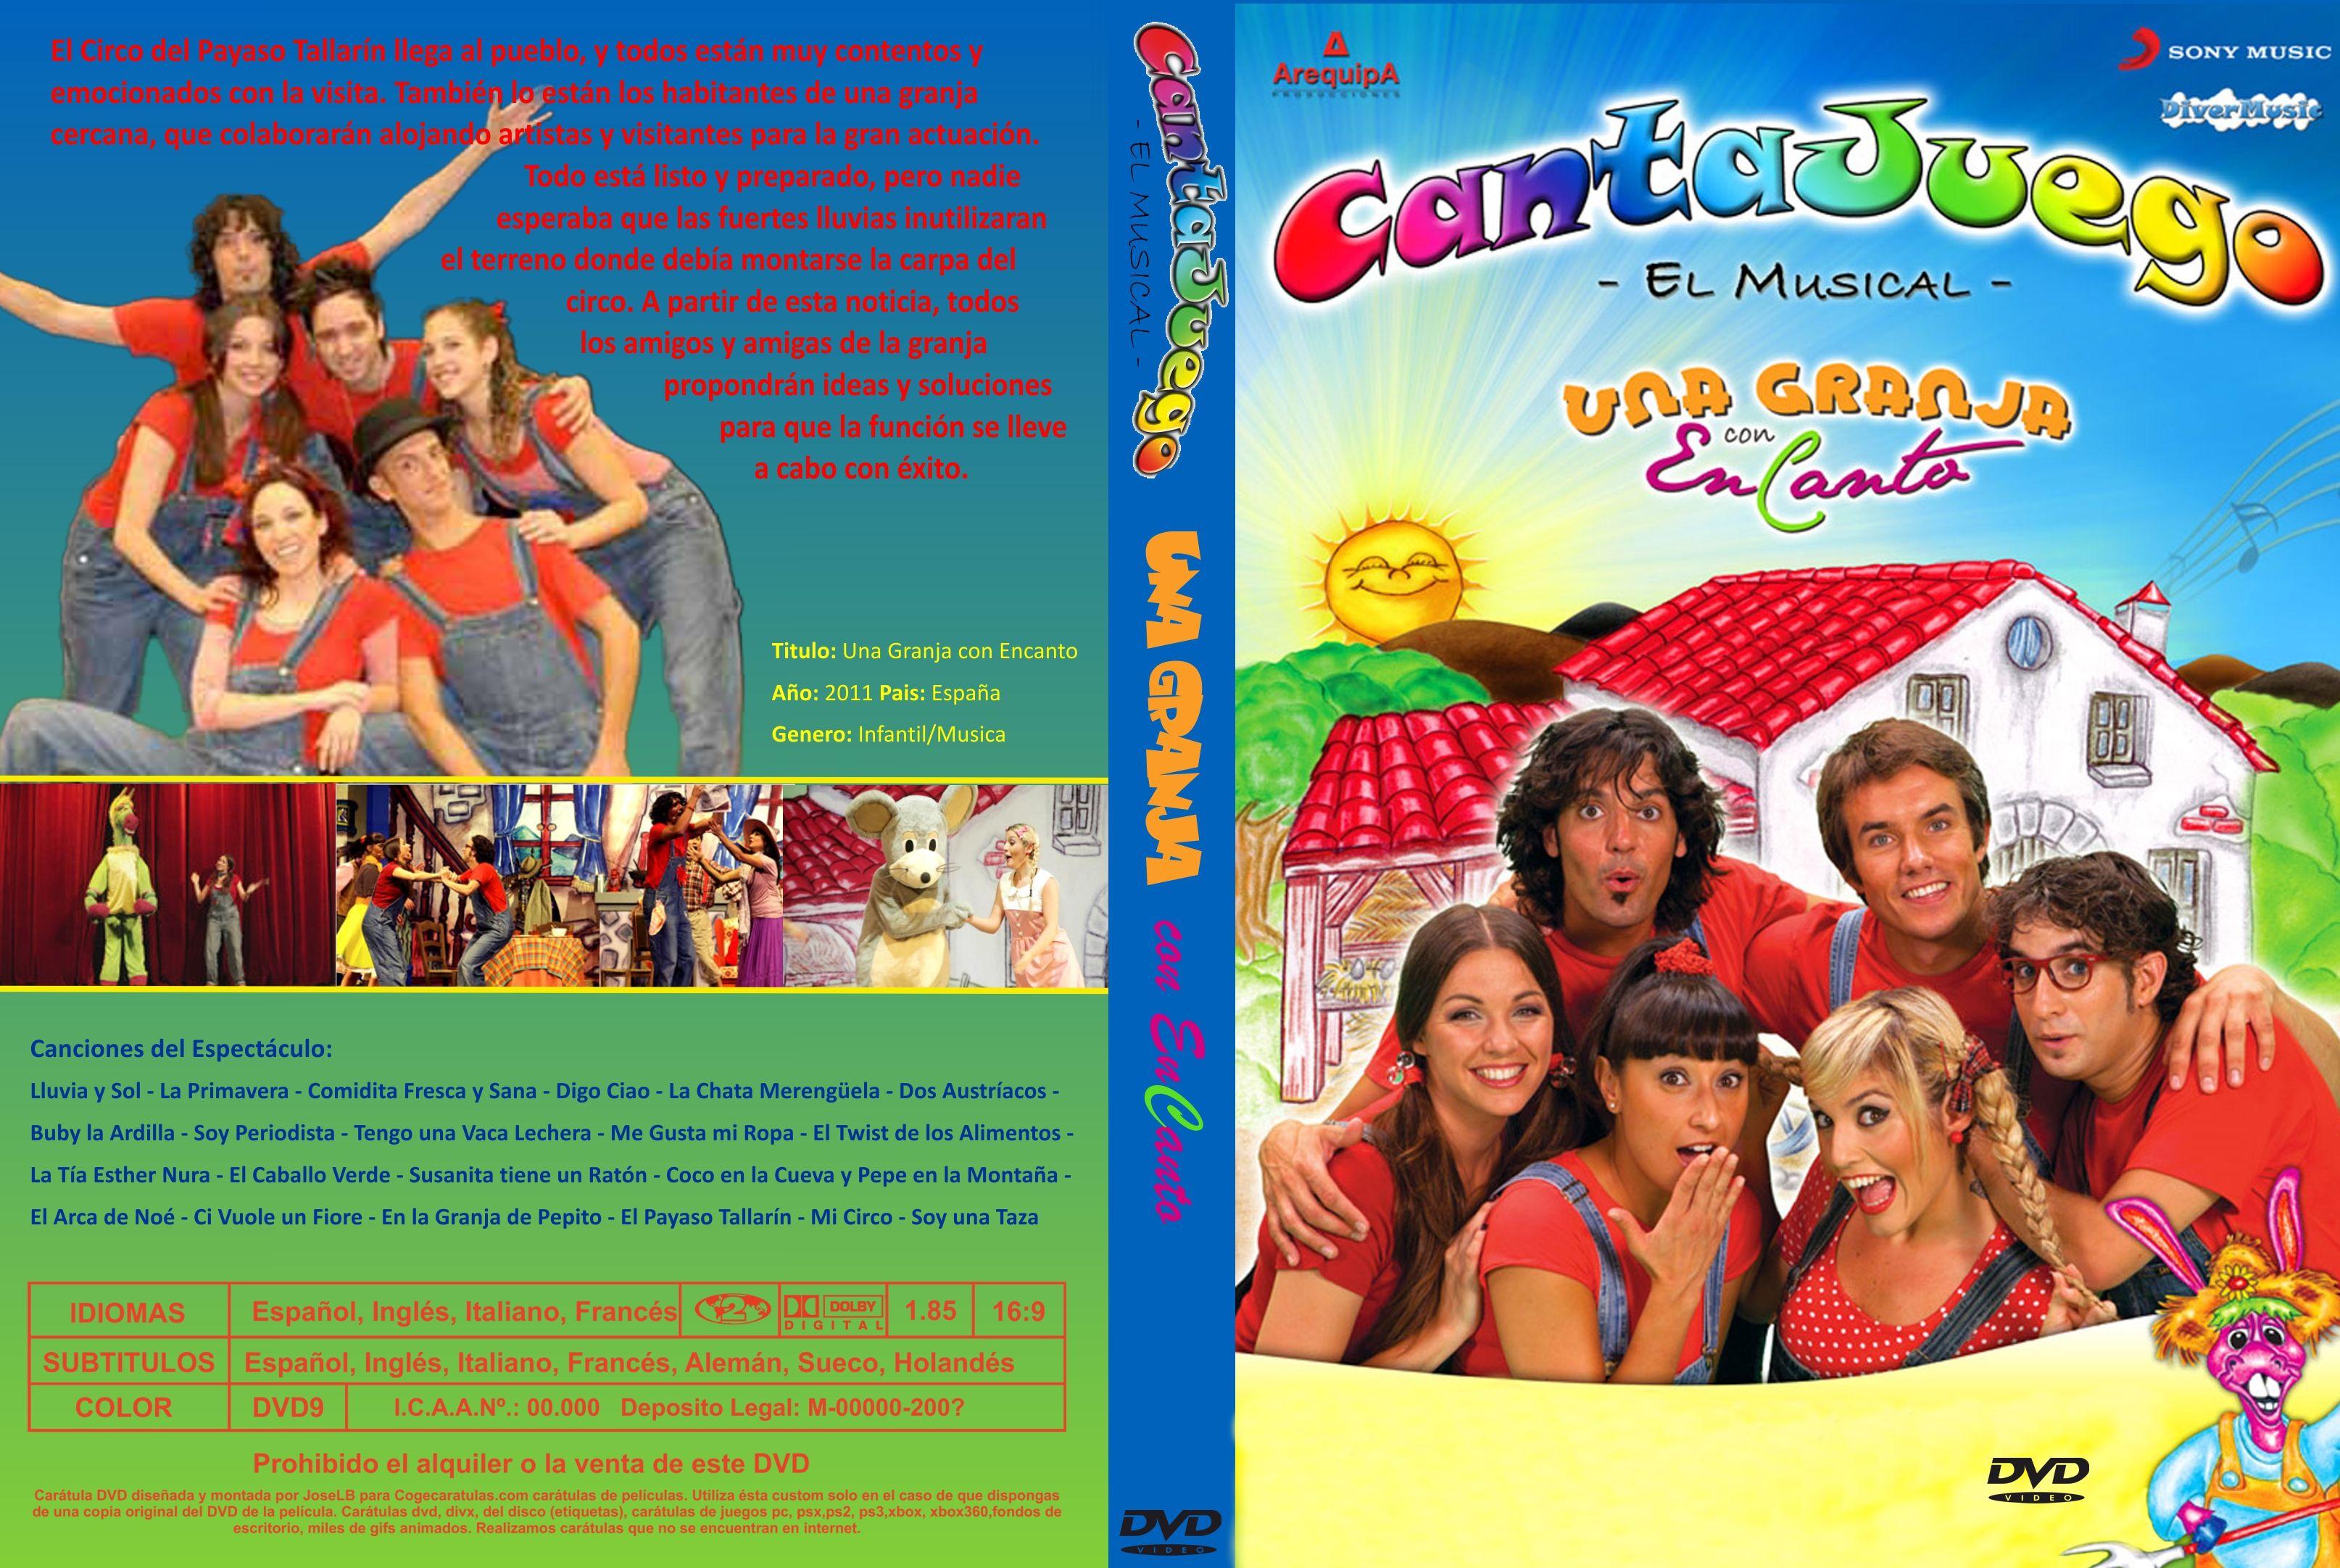 Caratula Dvd Cantajuegos